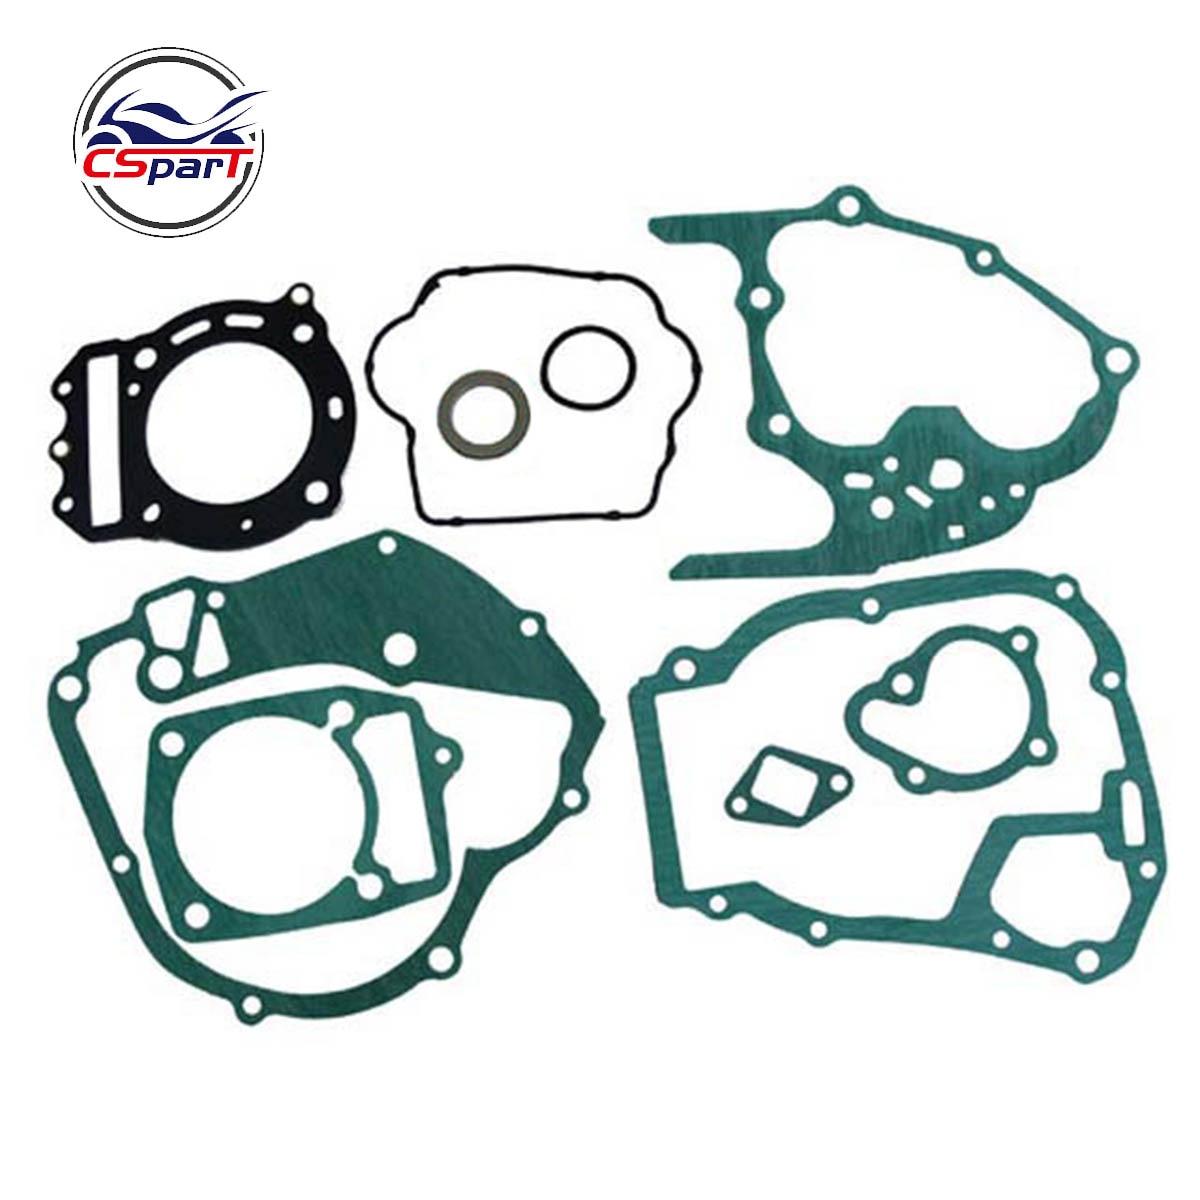 72MM Gasket Kit  For CFMOTO CF Moto 250 CF250 CN250 CH250 250CC Jonway Kazuma Znen  ATV UTV Buggy Scooter Parts